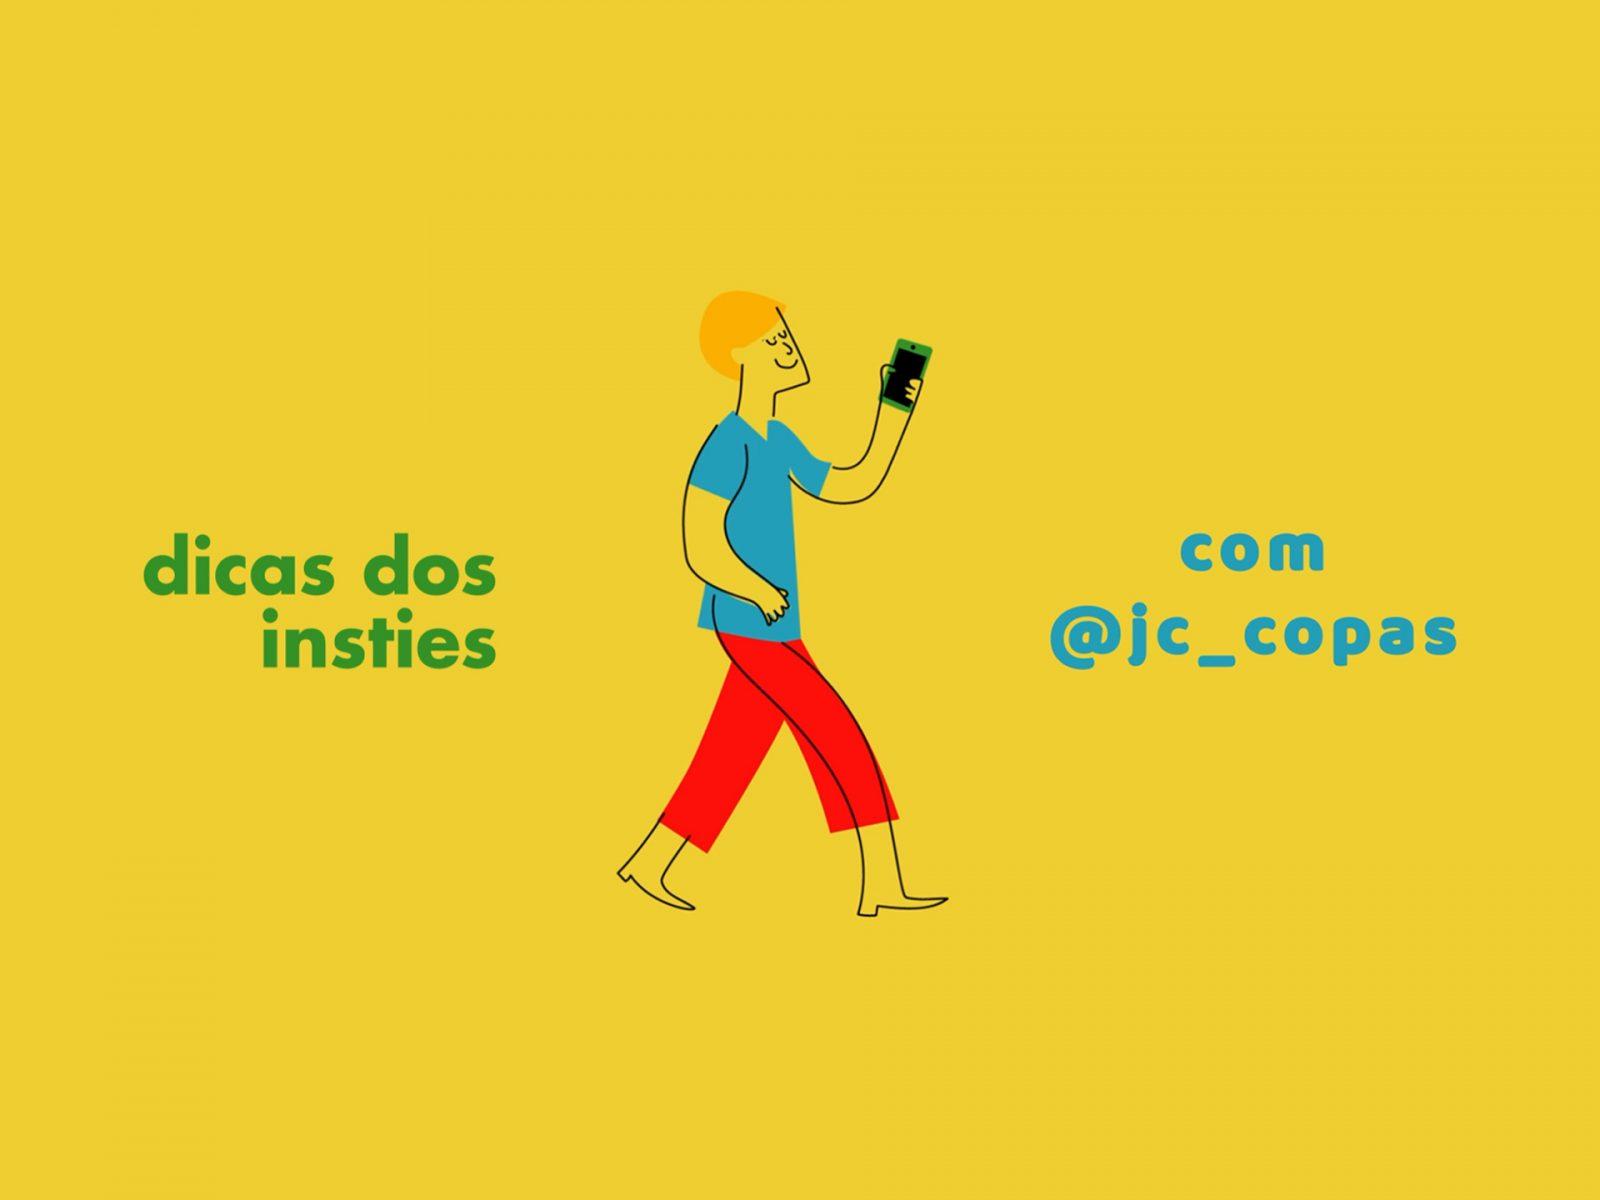 dicas_insties_jc_copas